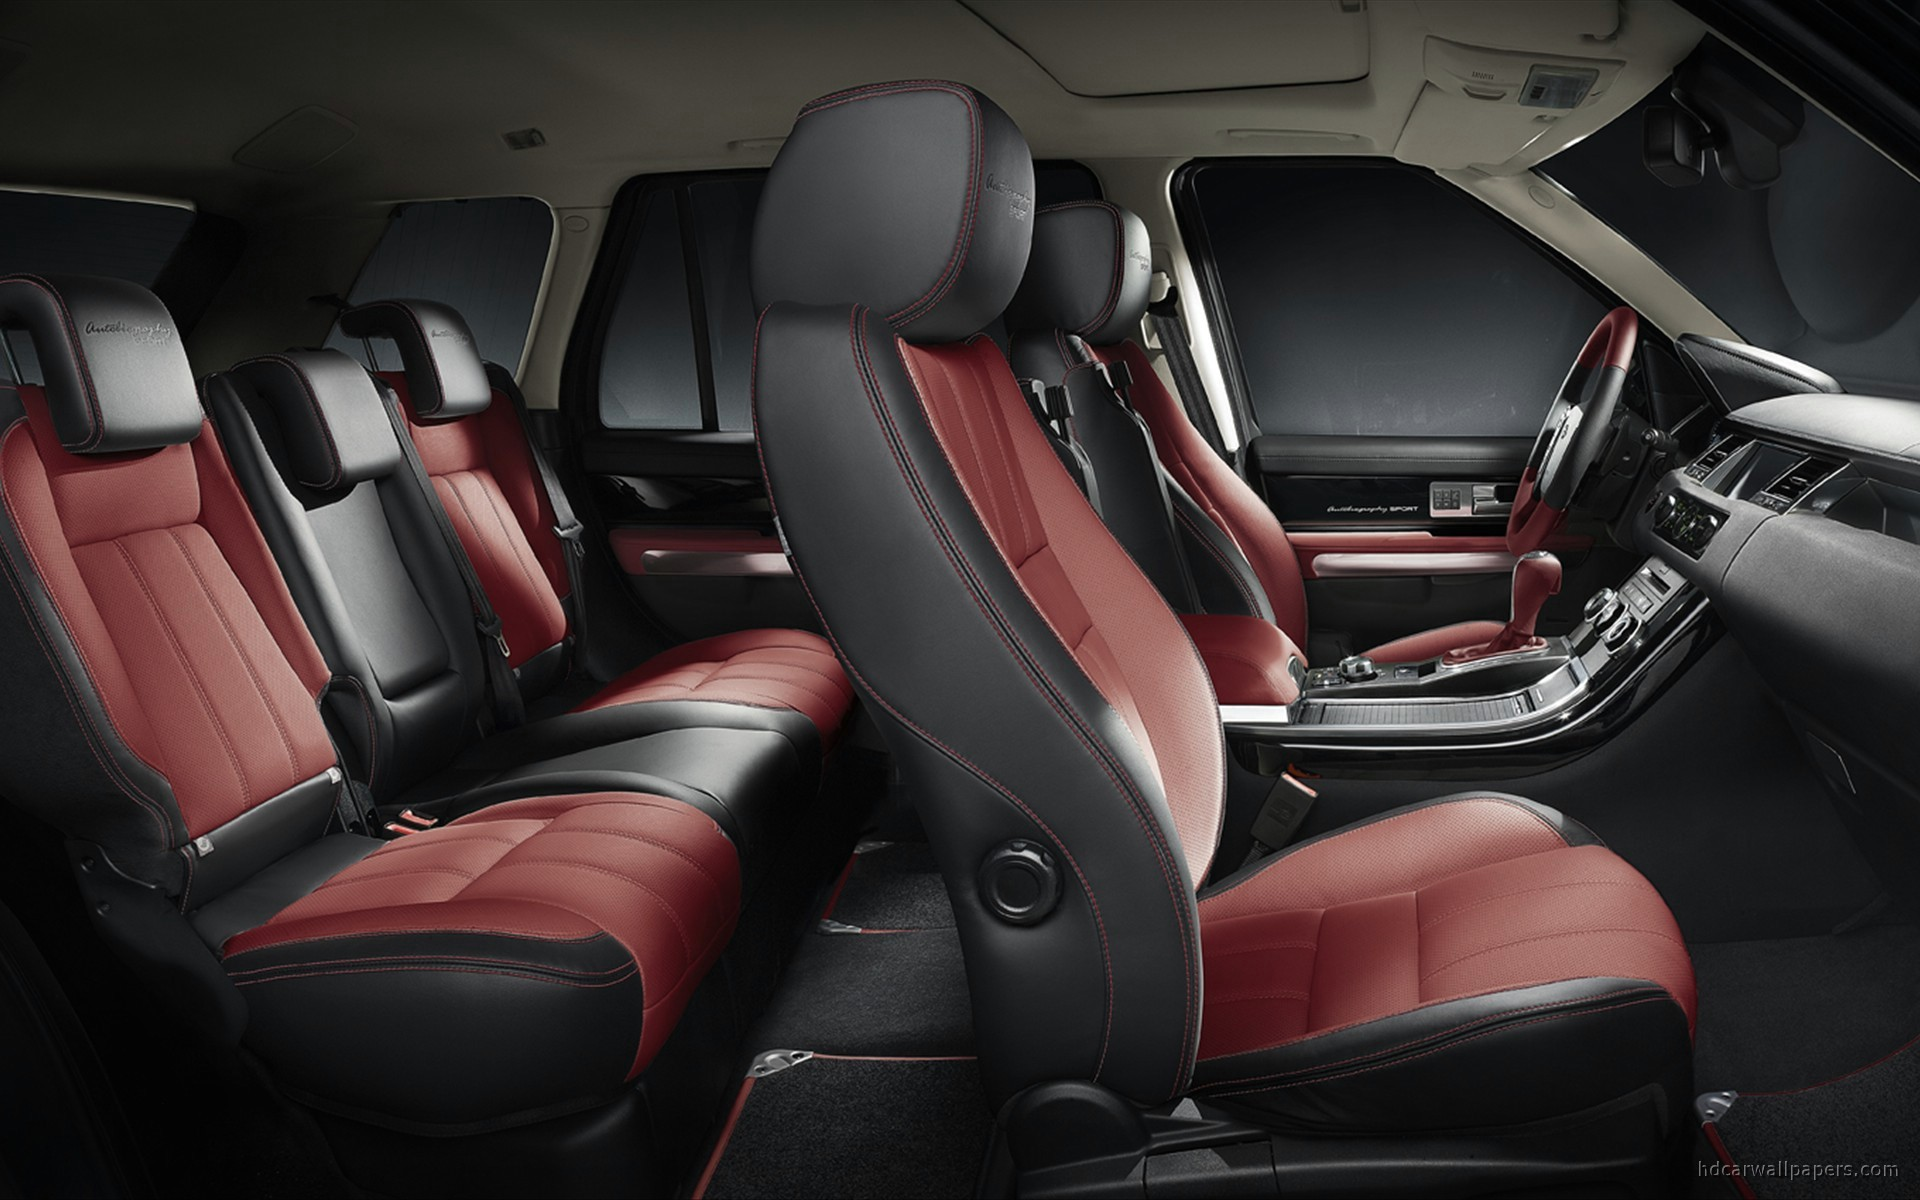 2010 Range Rover Sport Interior Wallpaper Hd Car